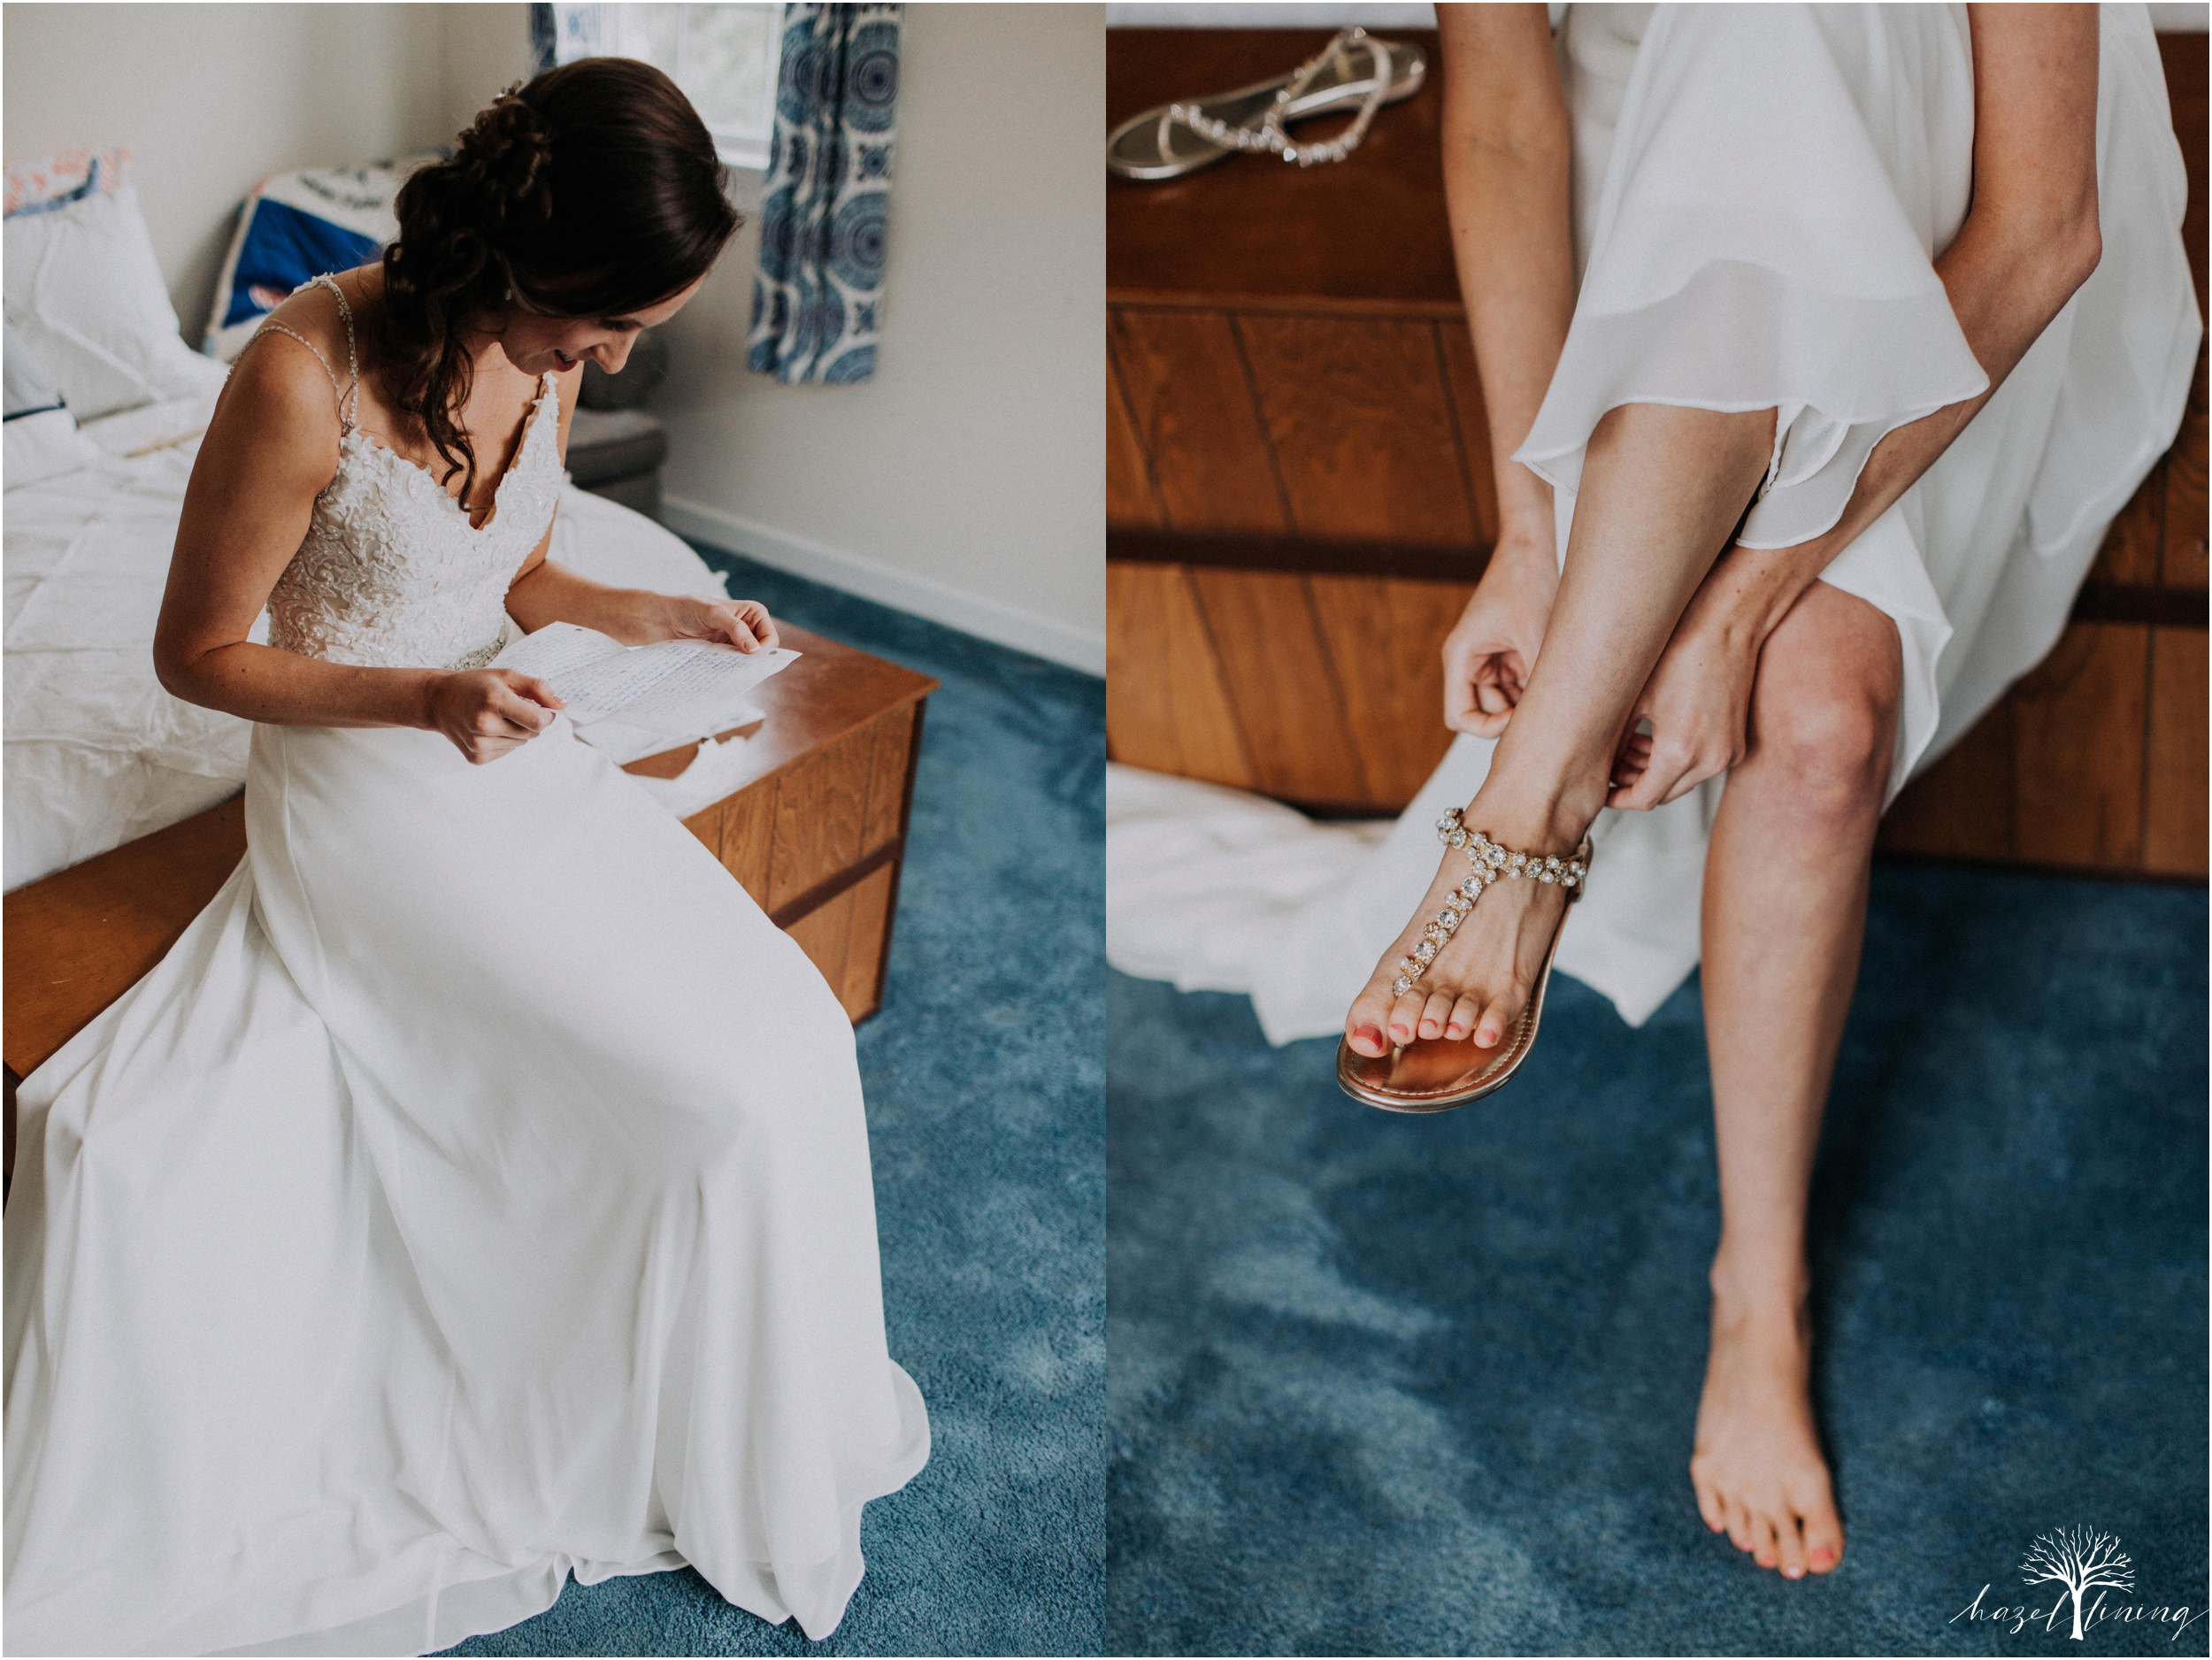 hazel-lining-travel-wedding-elopement-photography_0021.jpg